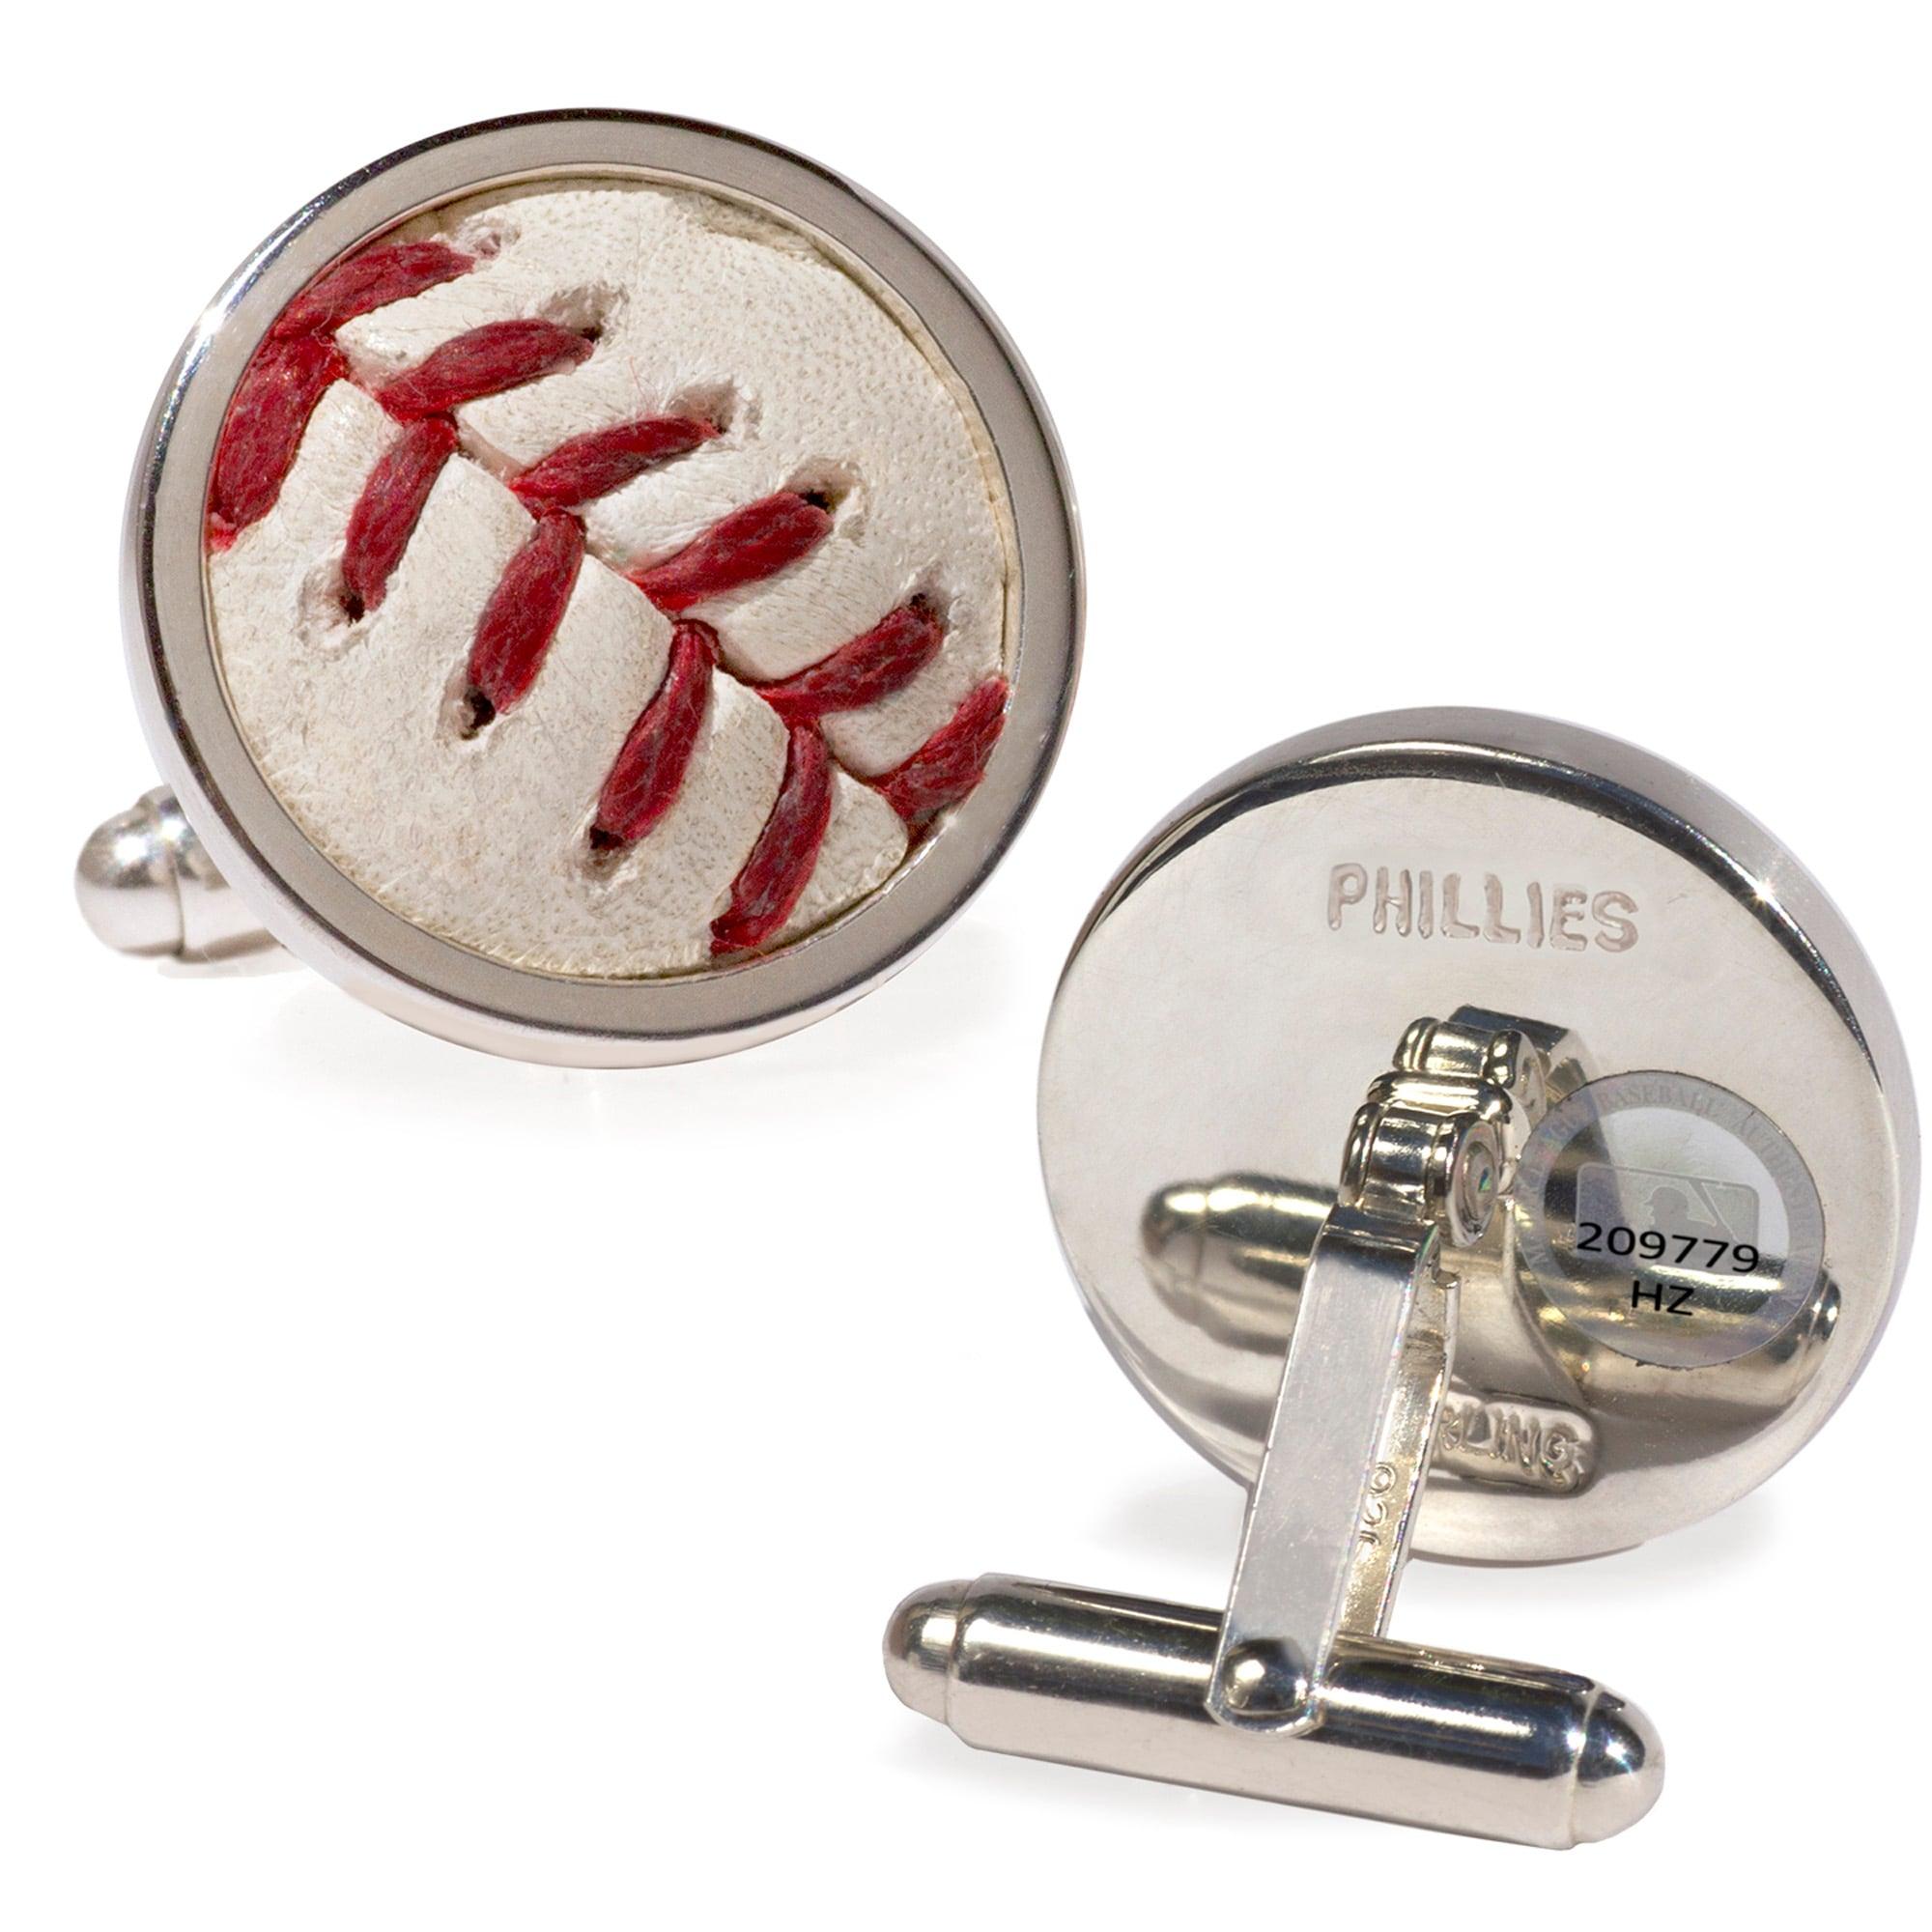 Philadelphia Phillies Tokens & Icons Game-Used Baseball Cuff Links